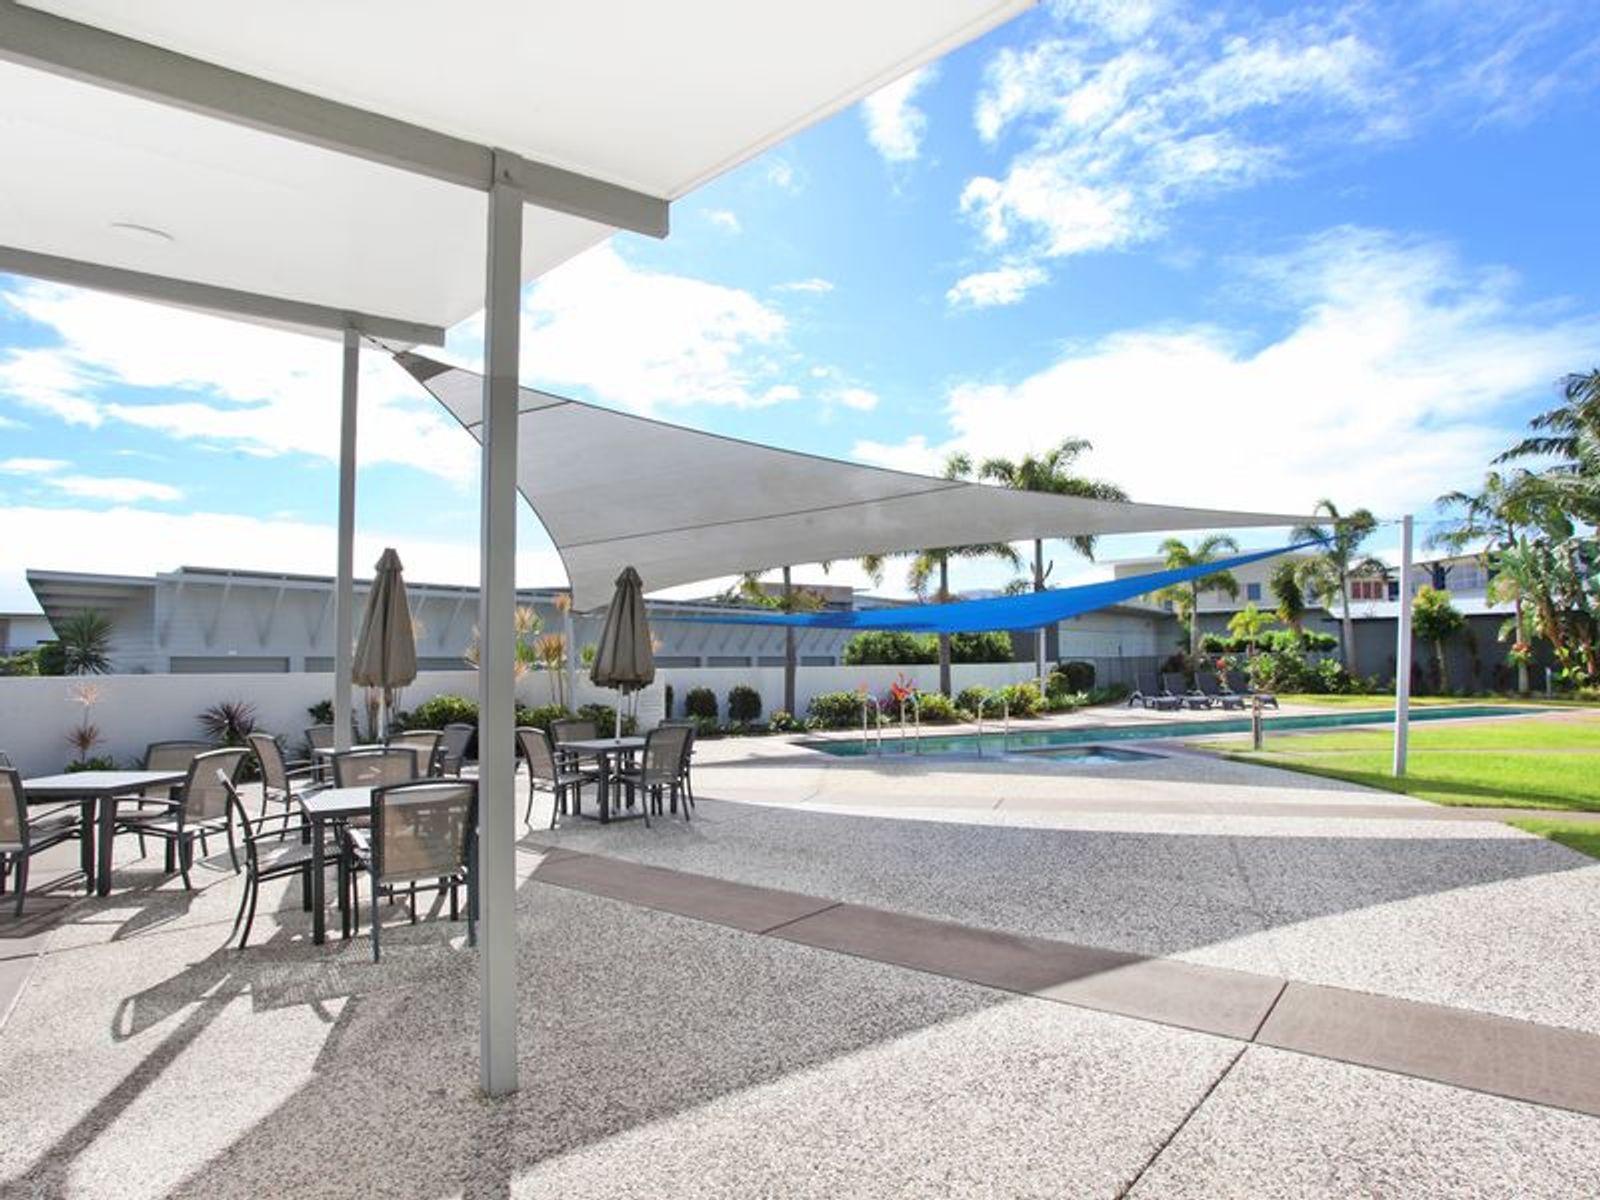 44/11 Innovation Parkway, Birtinya, QLD 4575